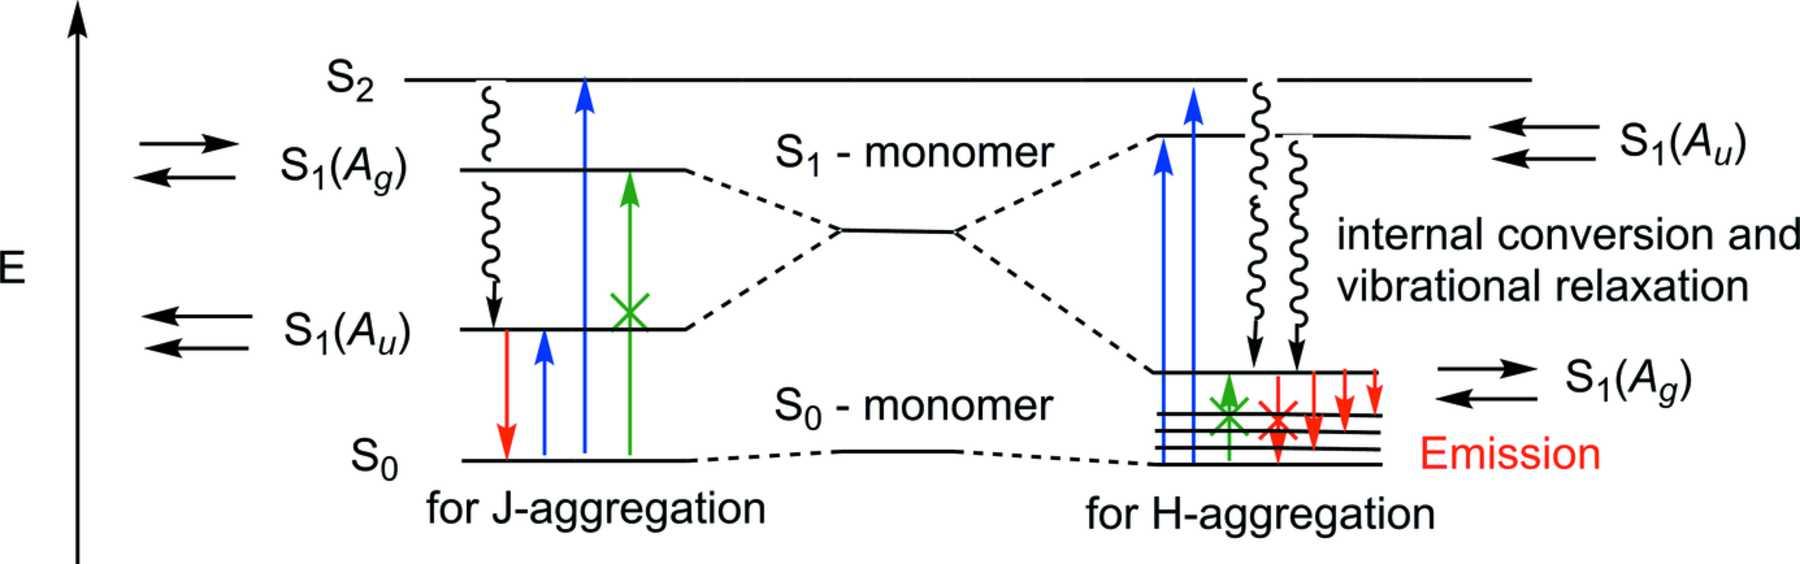 Iucr span classsymbolspanspan classsymbolspan disable zoom view article download ppt figure 1 jablonski diagram ccuart Choice Image